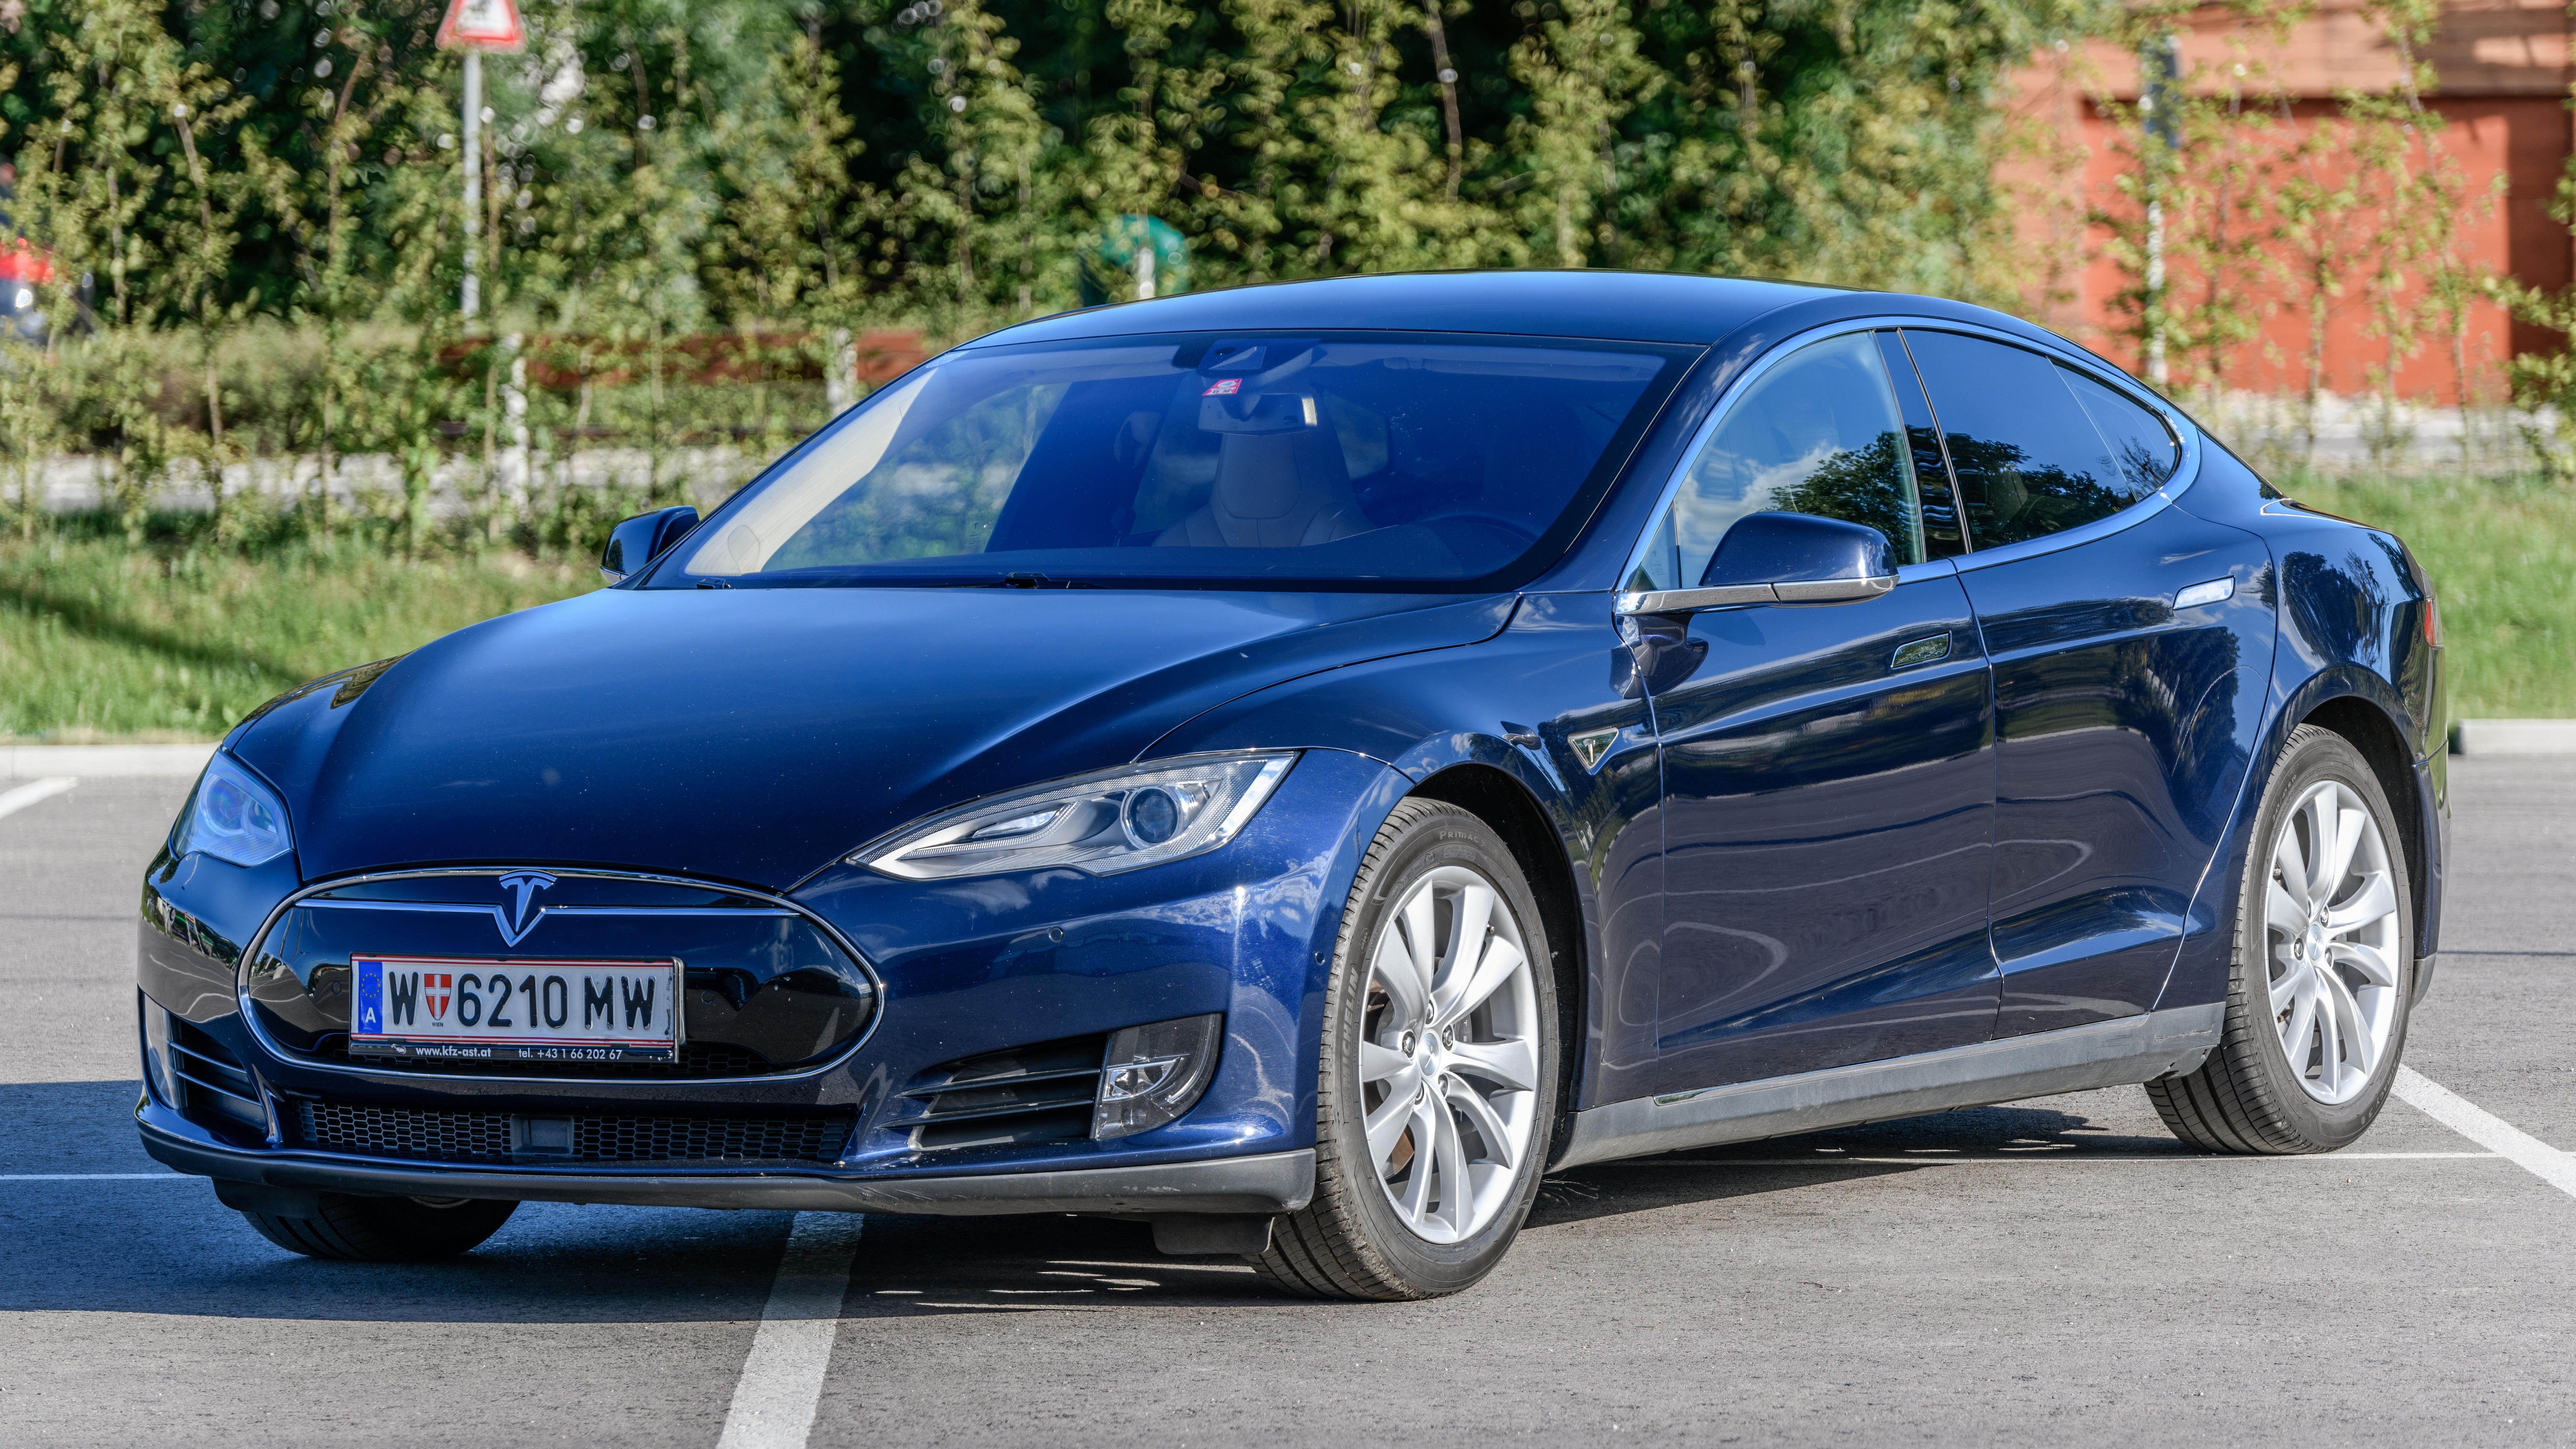 Astonishing Tesla Model S Wikipedia Wiring Cloud Hisonuggs Outletorg